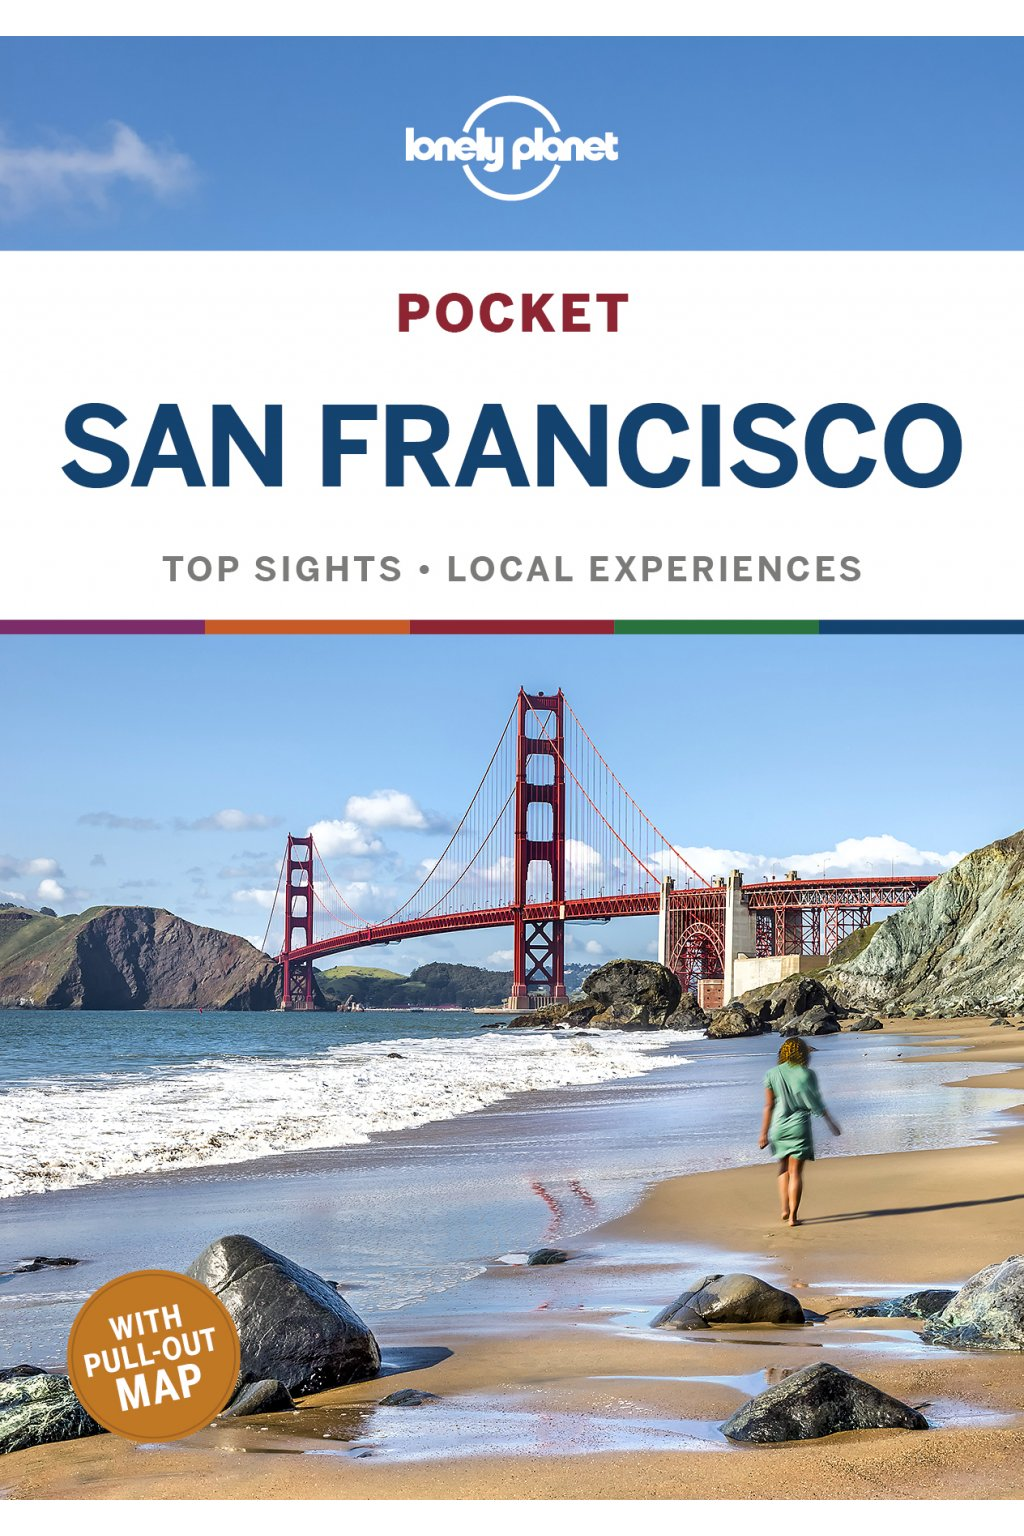 55542 San Francisco Poscket 9781787014114